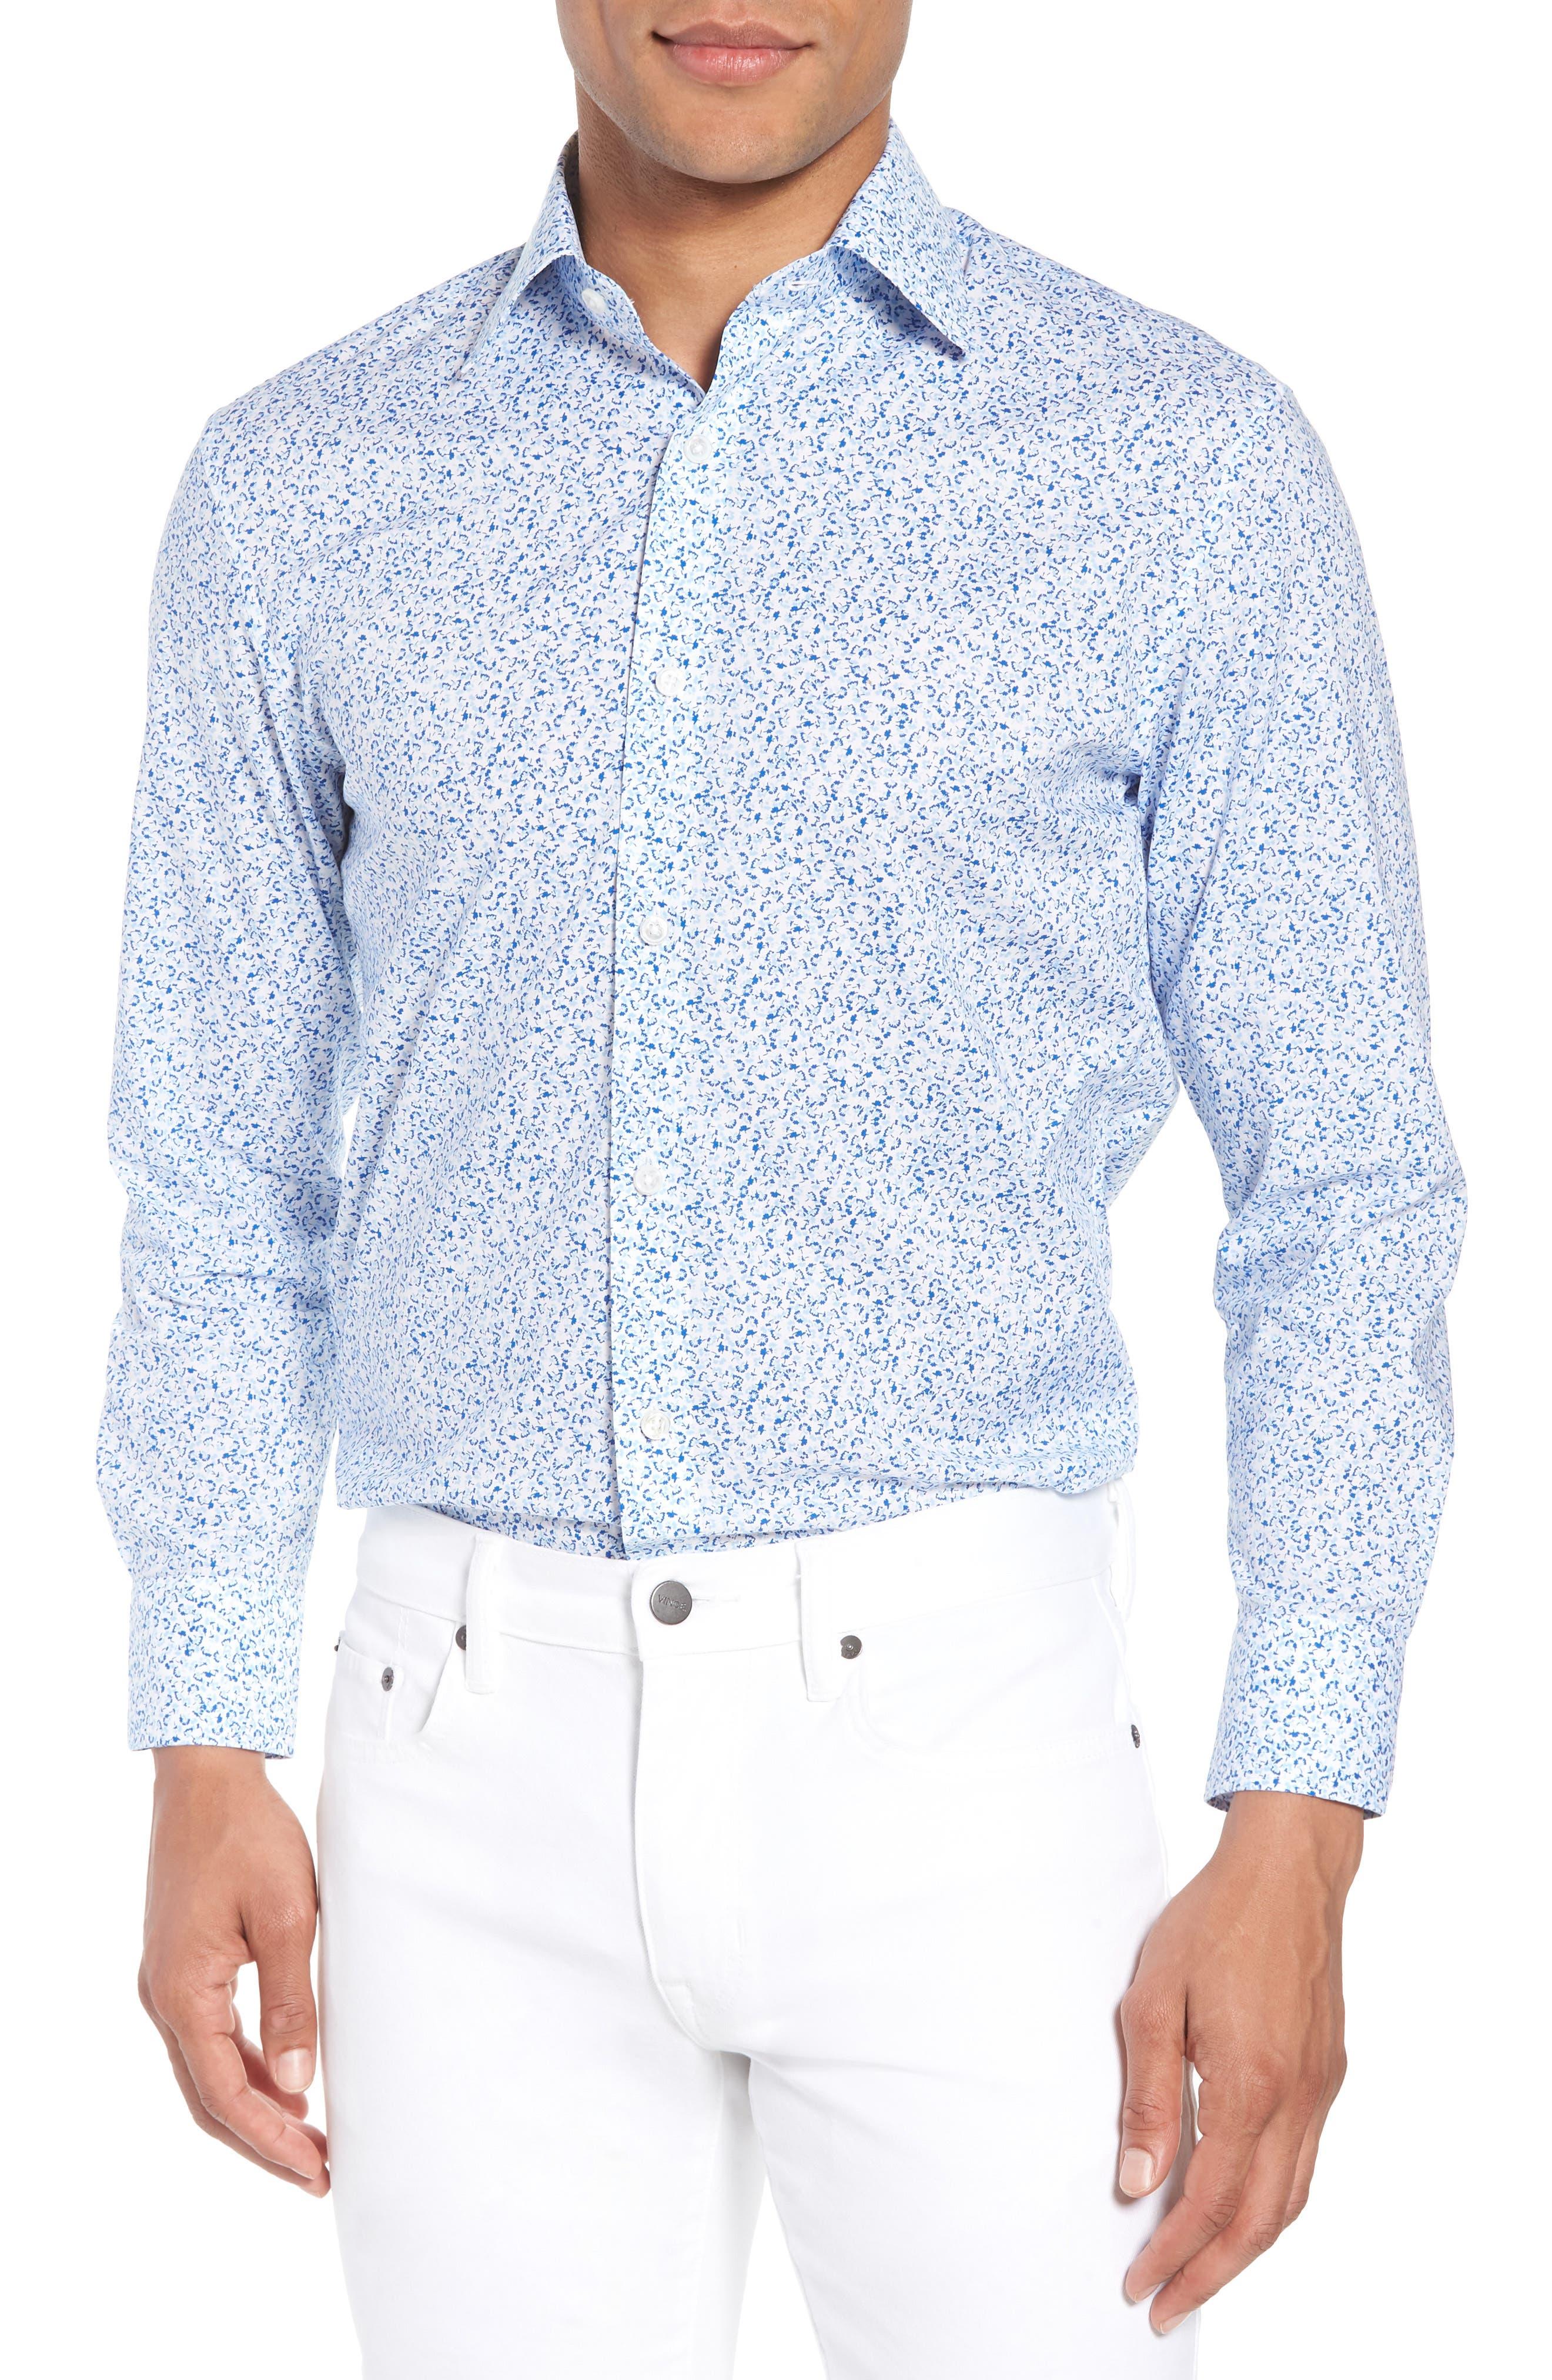 Jetsetter Slim Fit Floral Dress Shirt,                             Main thumbnail 1, color,                             400